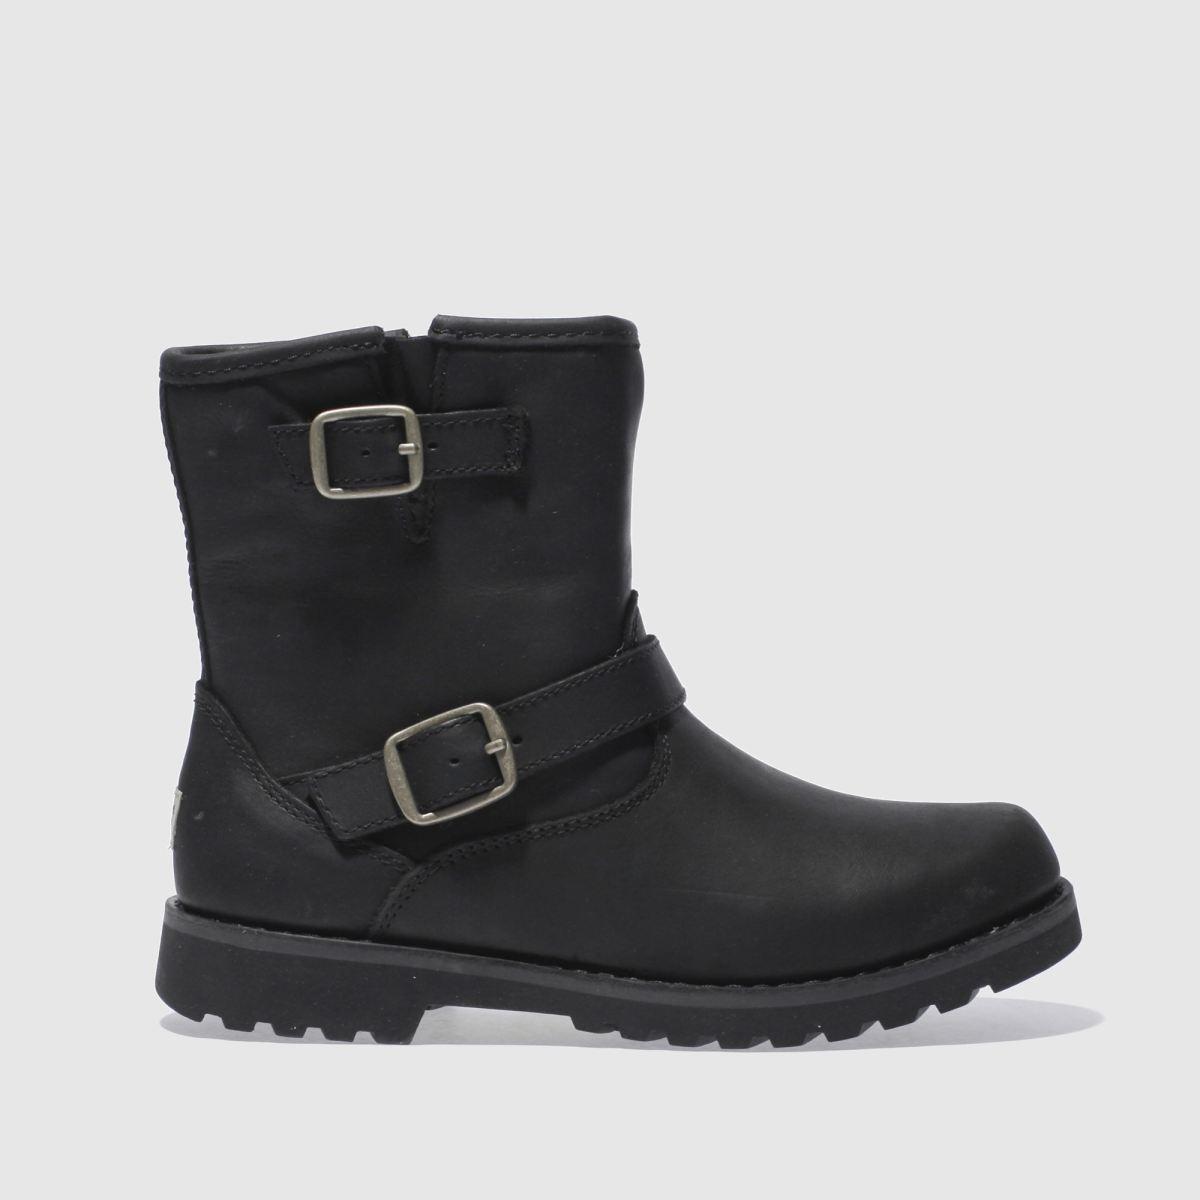 UGG Australia Ugg Black Harwell Boots Junior